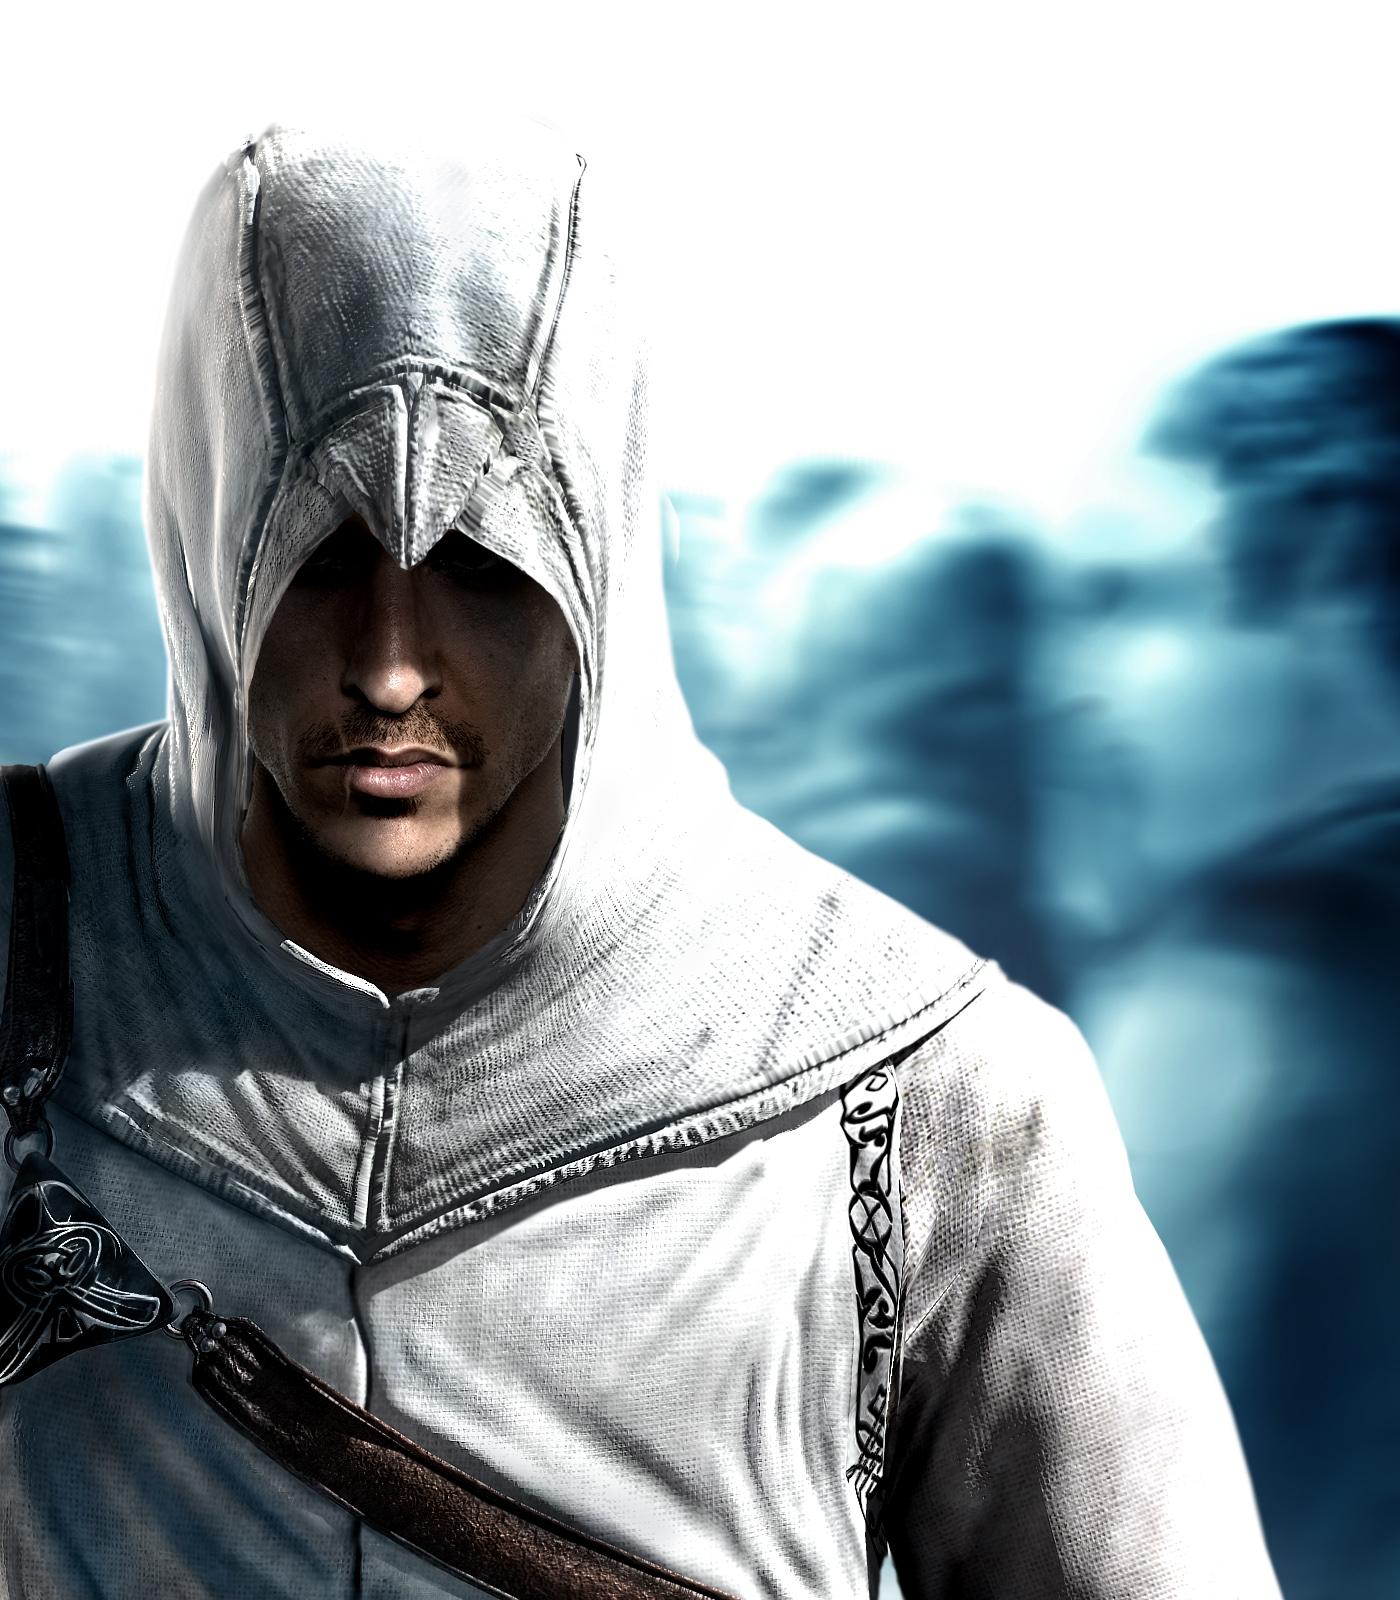 Арт к игре Assassin's Creed